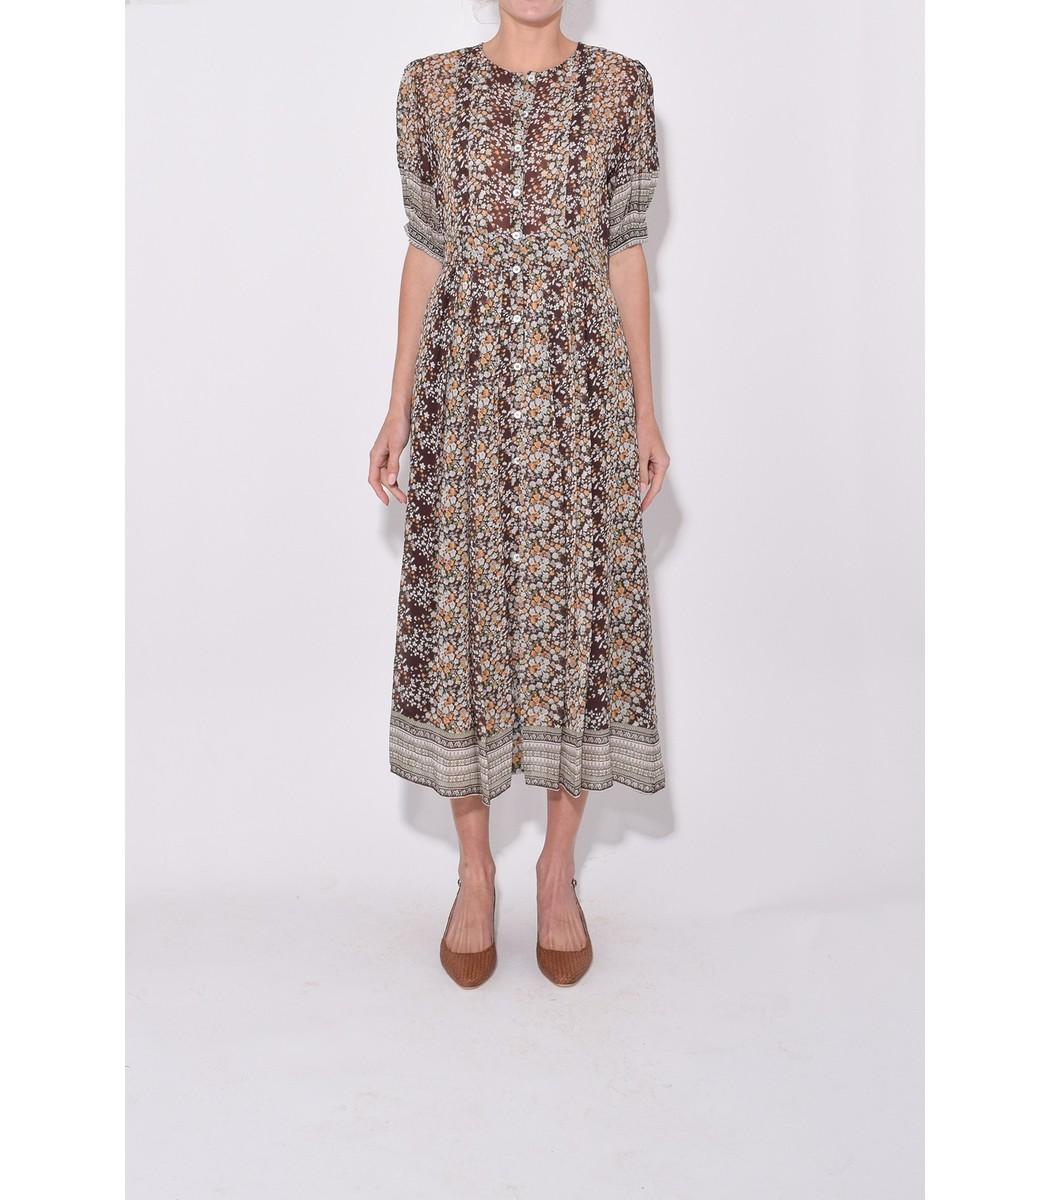 08bd28cdf18 Sea Maya Short Sleeve Midi Dress in Brown Multi - ShopBAZAAR